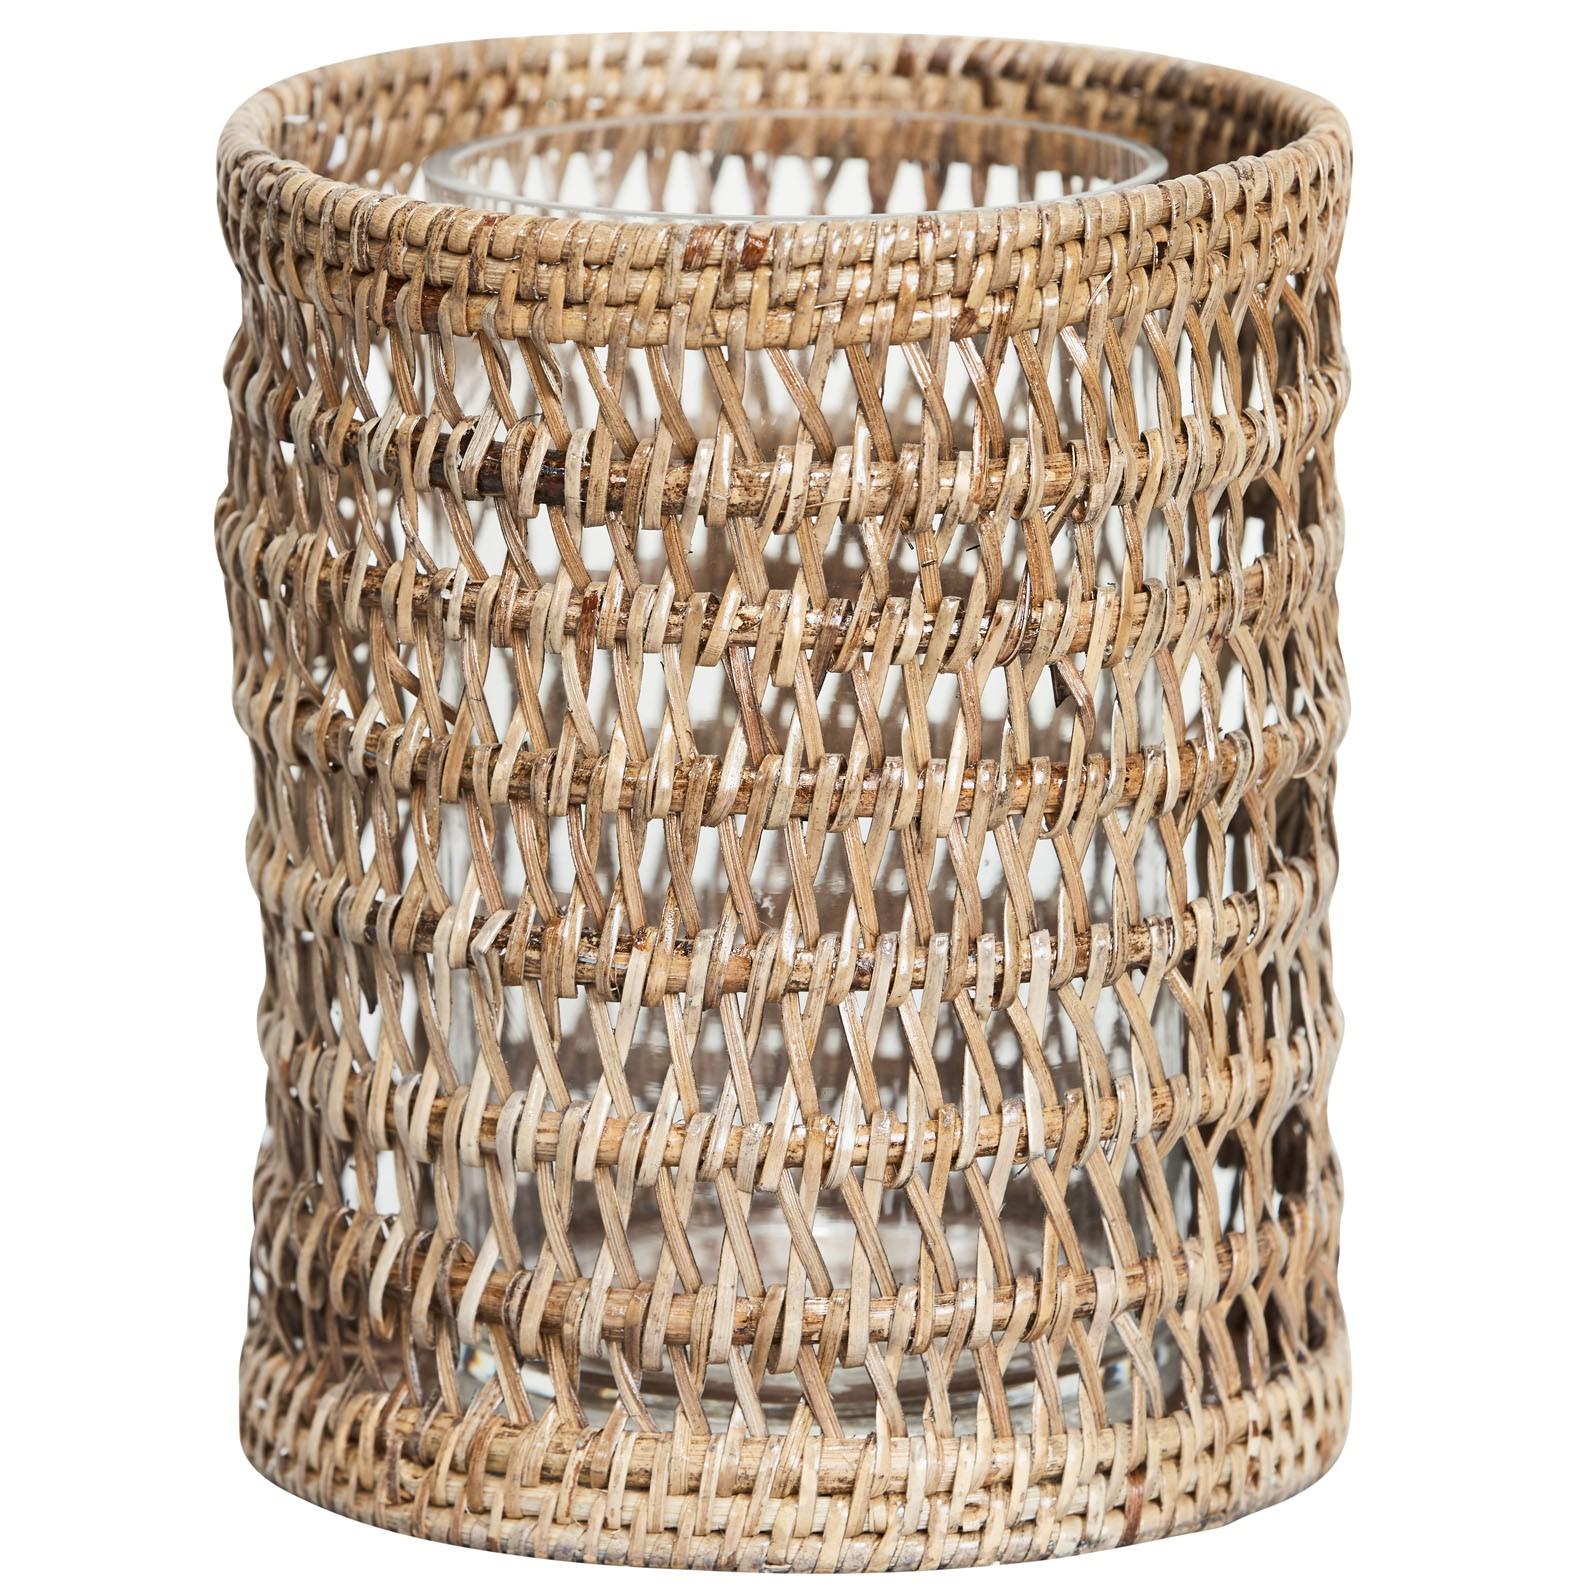 pavillion candleholder - hand woven rattan